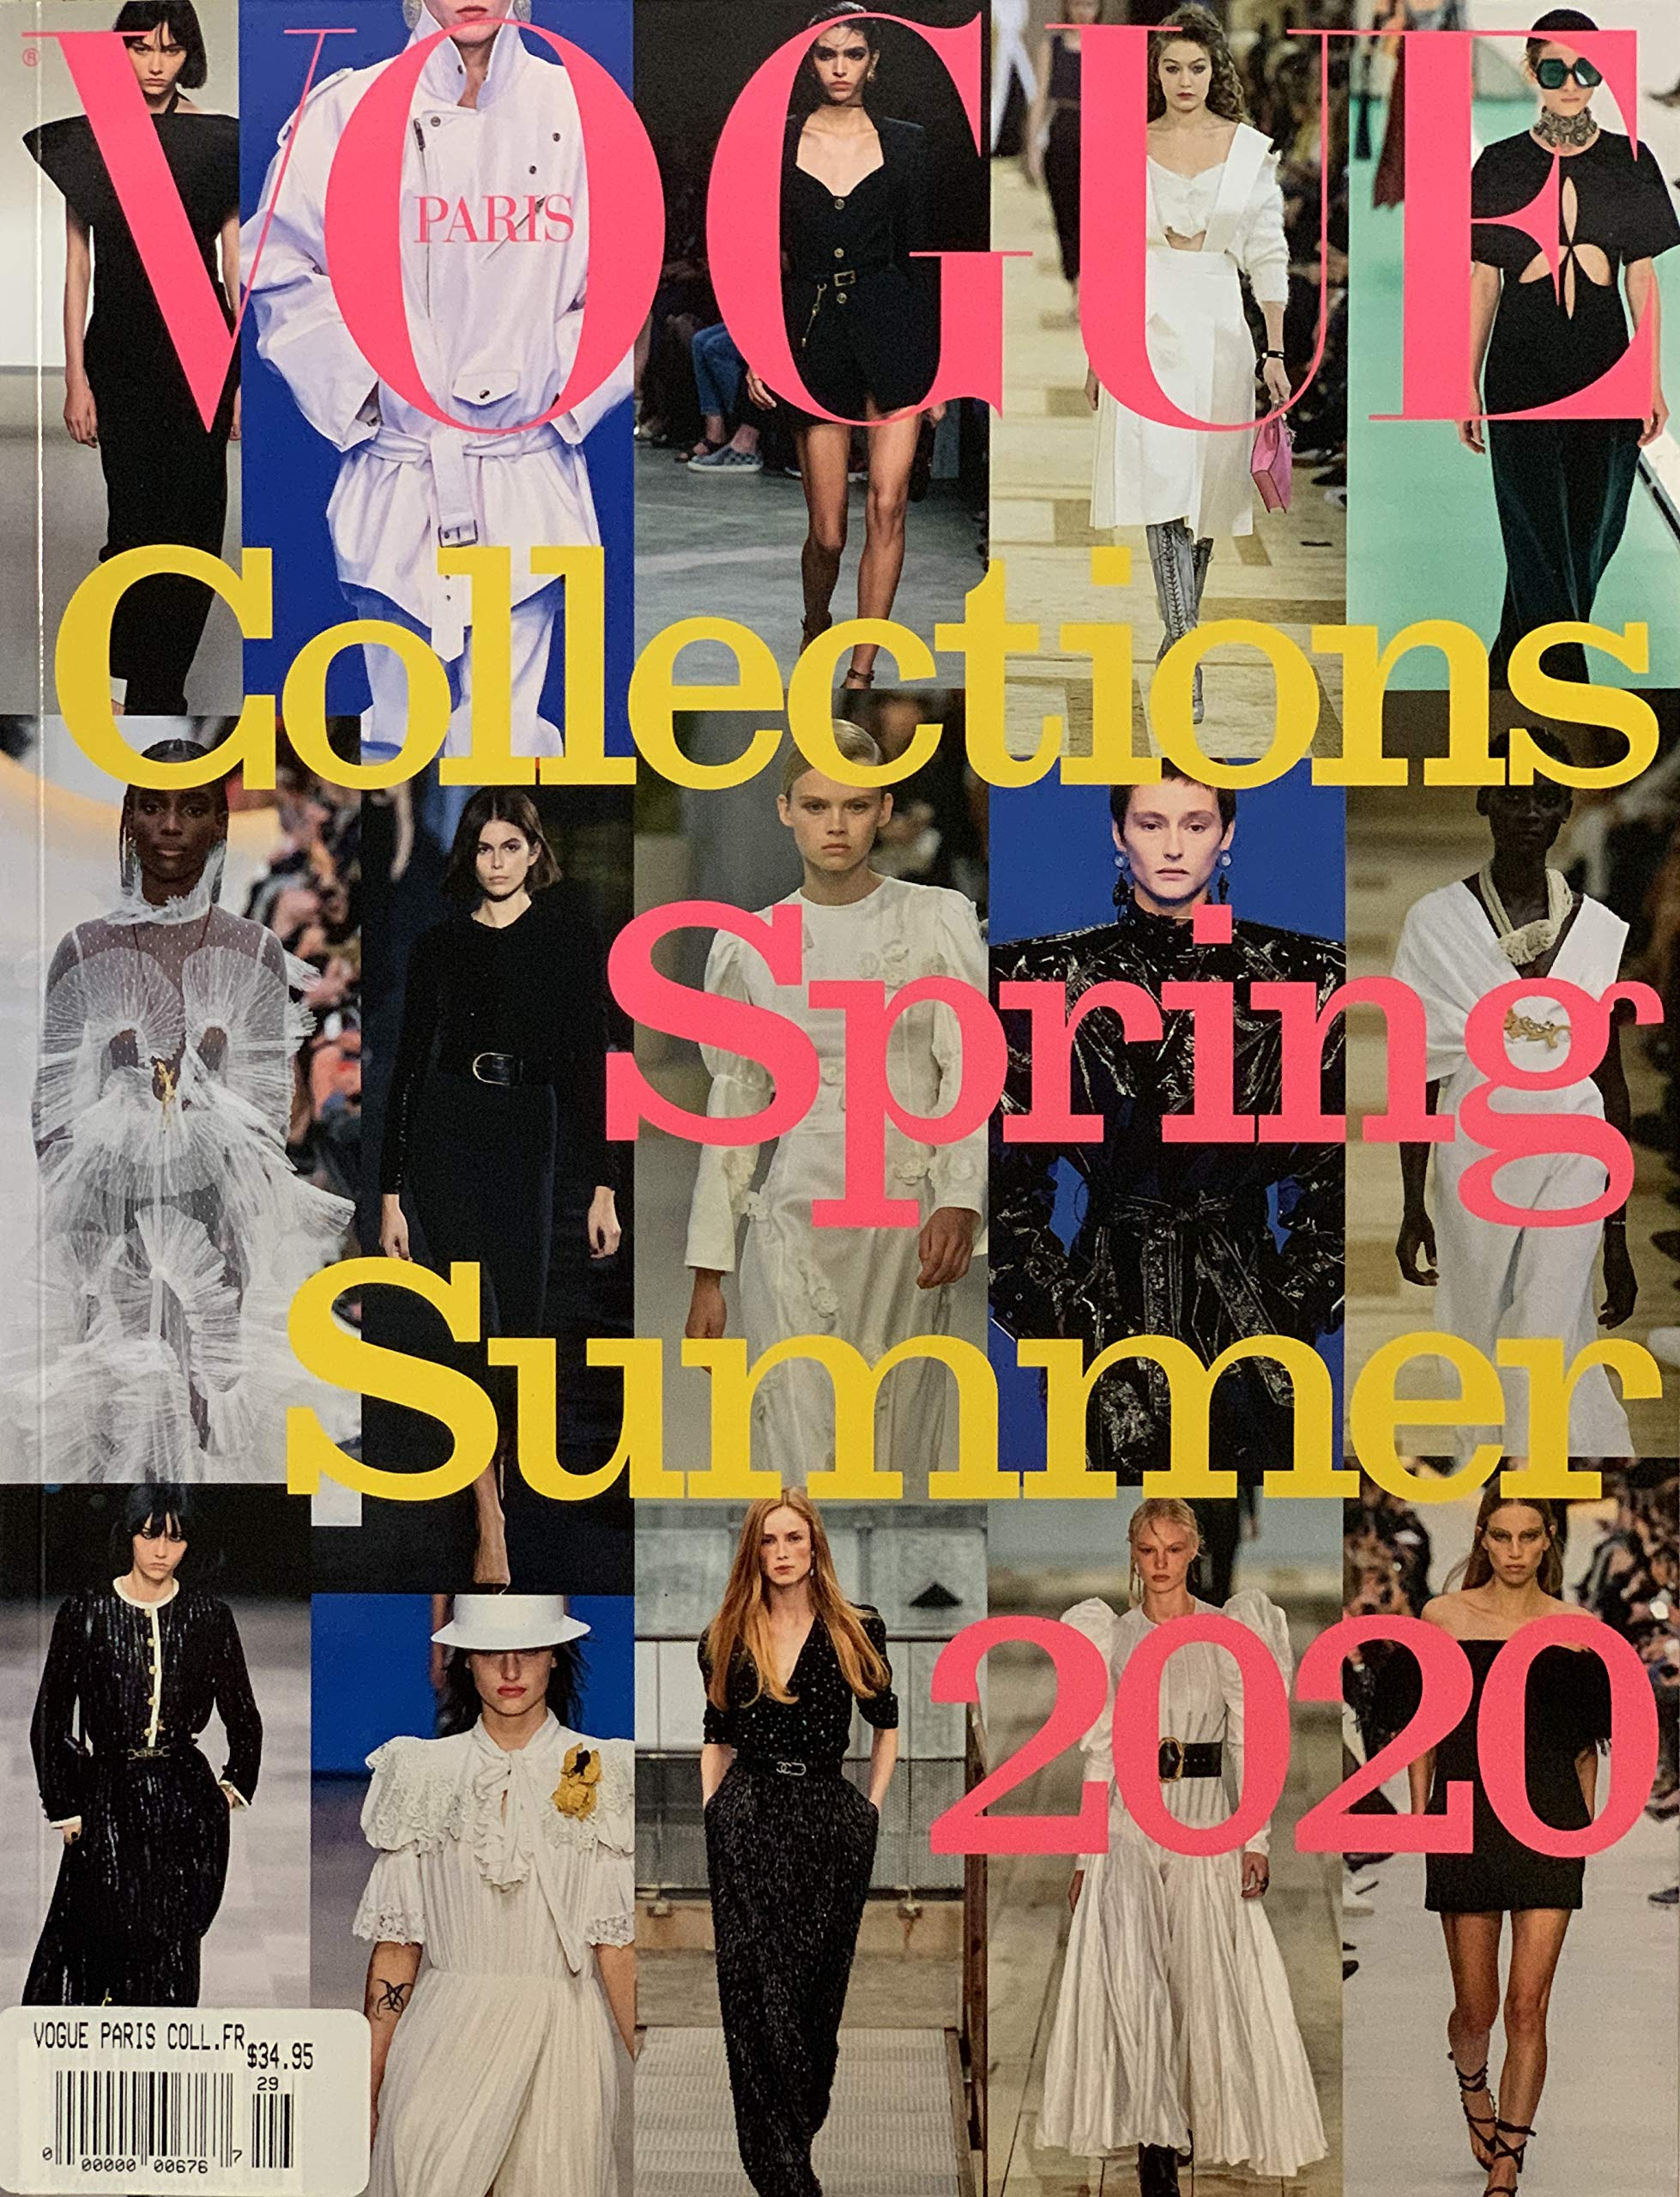 Vogue Paris Collection Magazine Spring Summer 2020 Conde Nast Amazon Com Books